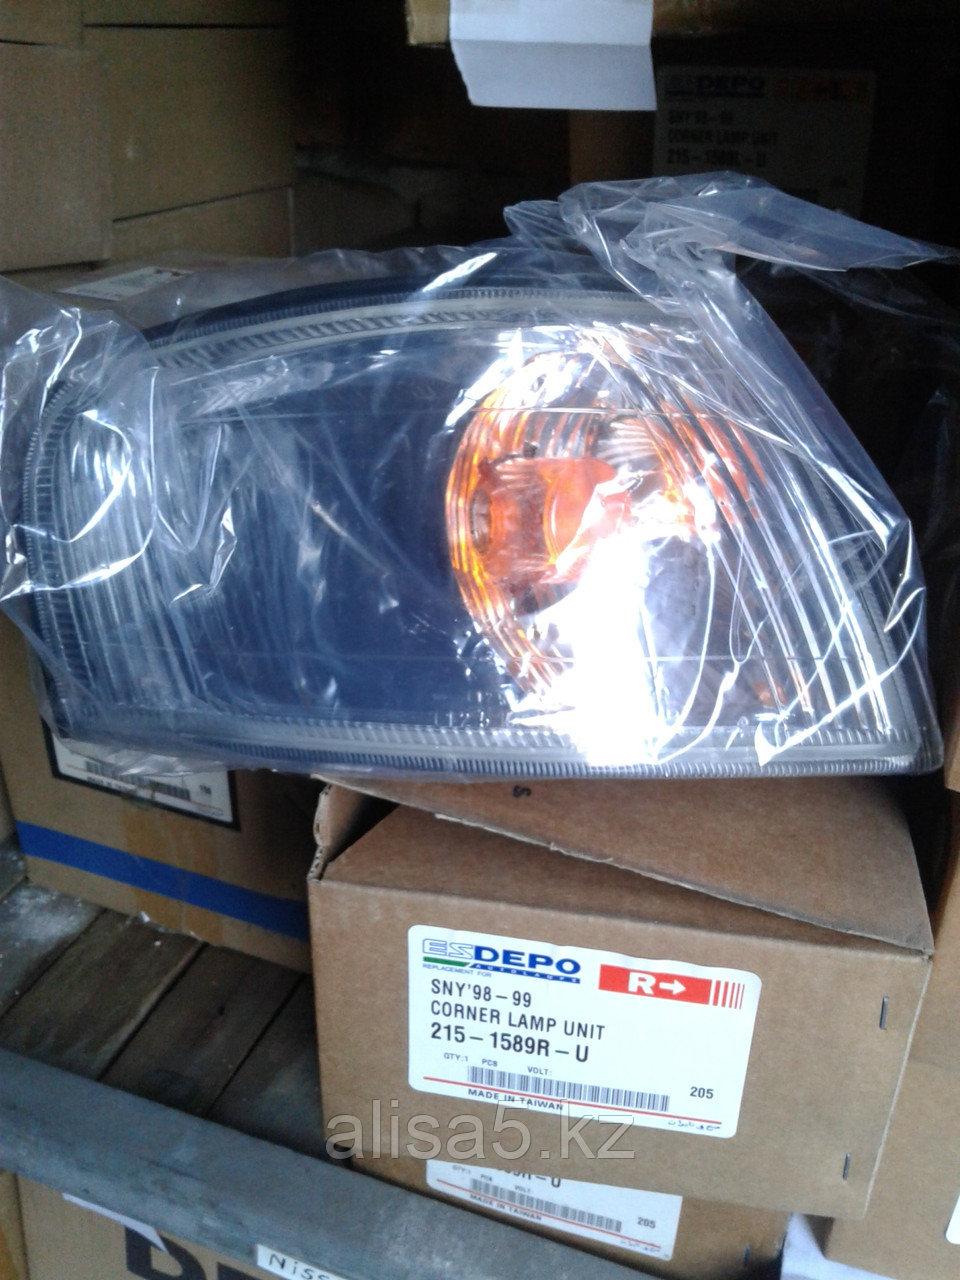 Nissan Sunny B-14  1998-1999 гг. Поворотник правый (Coner lamp  rh) 215-1589 R